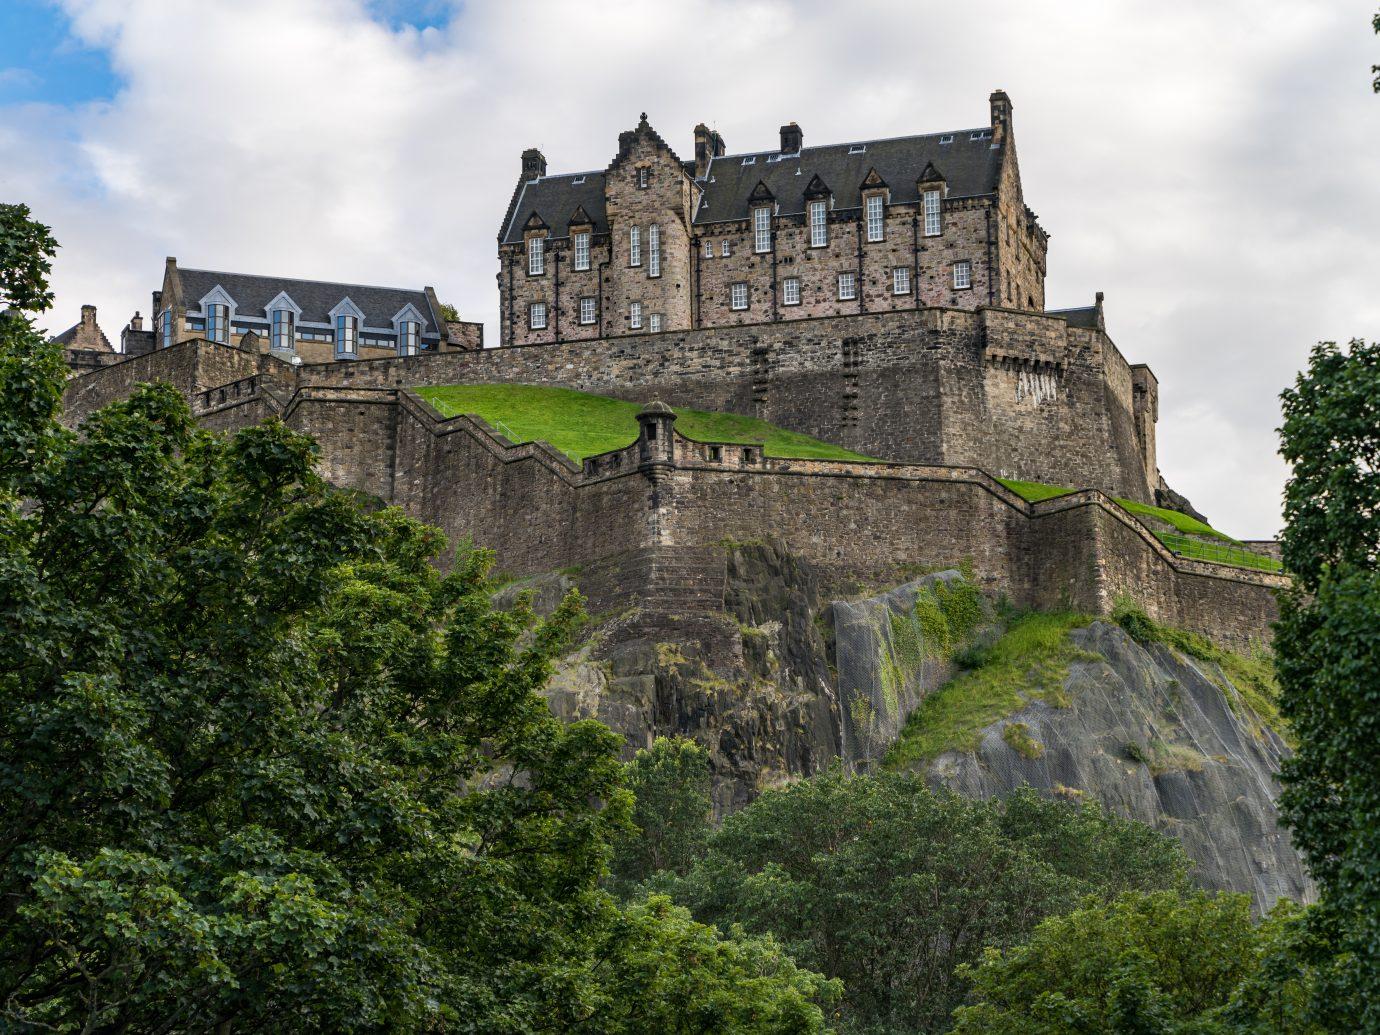 Scenic view of Edinburgh Castle on Castle rock, Edinburgh, Scotland